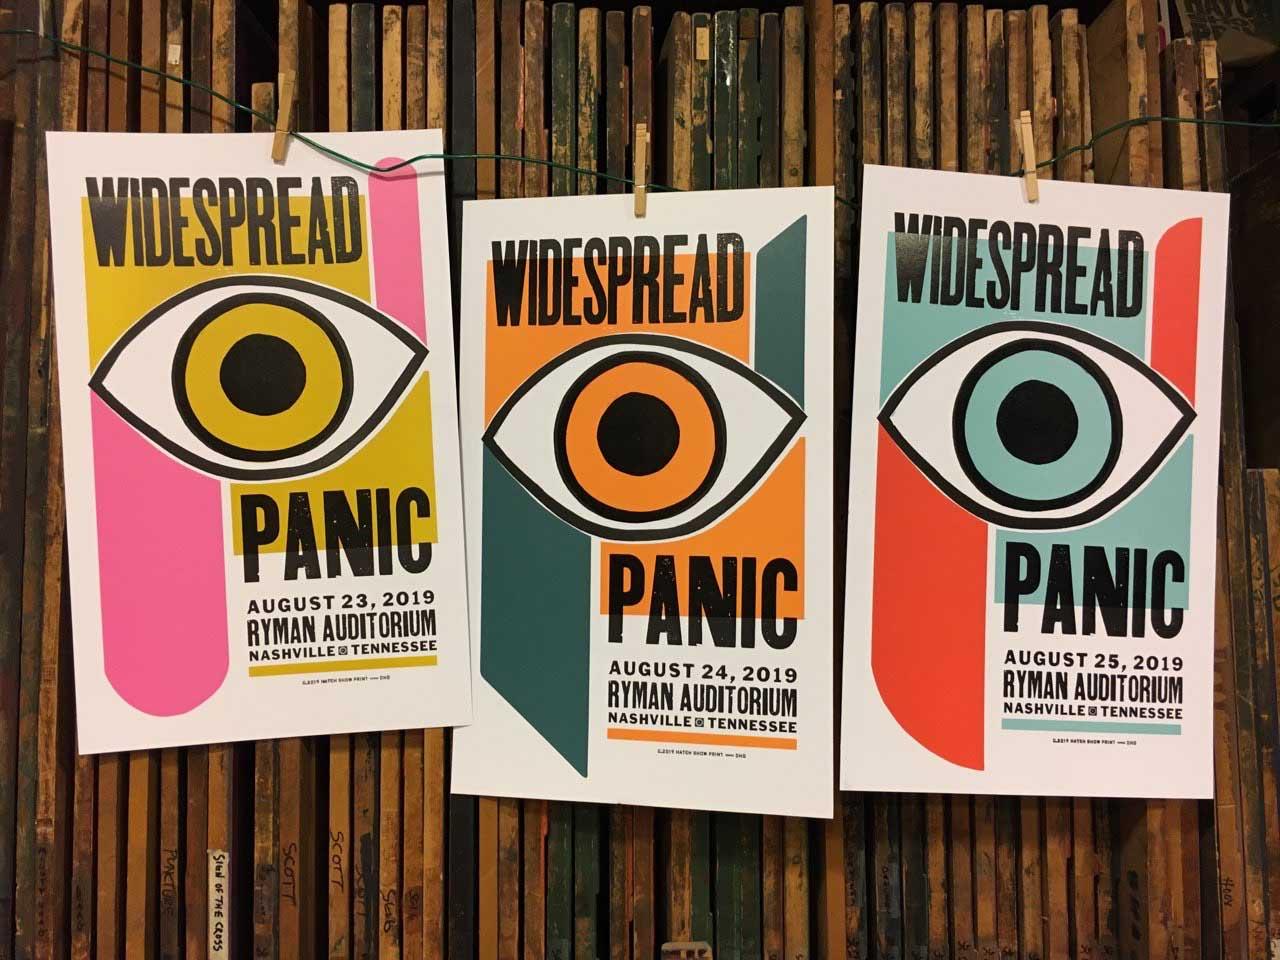 Nashville 2019 Show Poster by Hatch Show Print